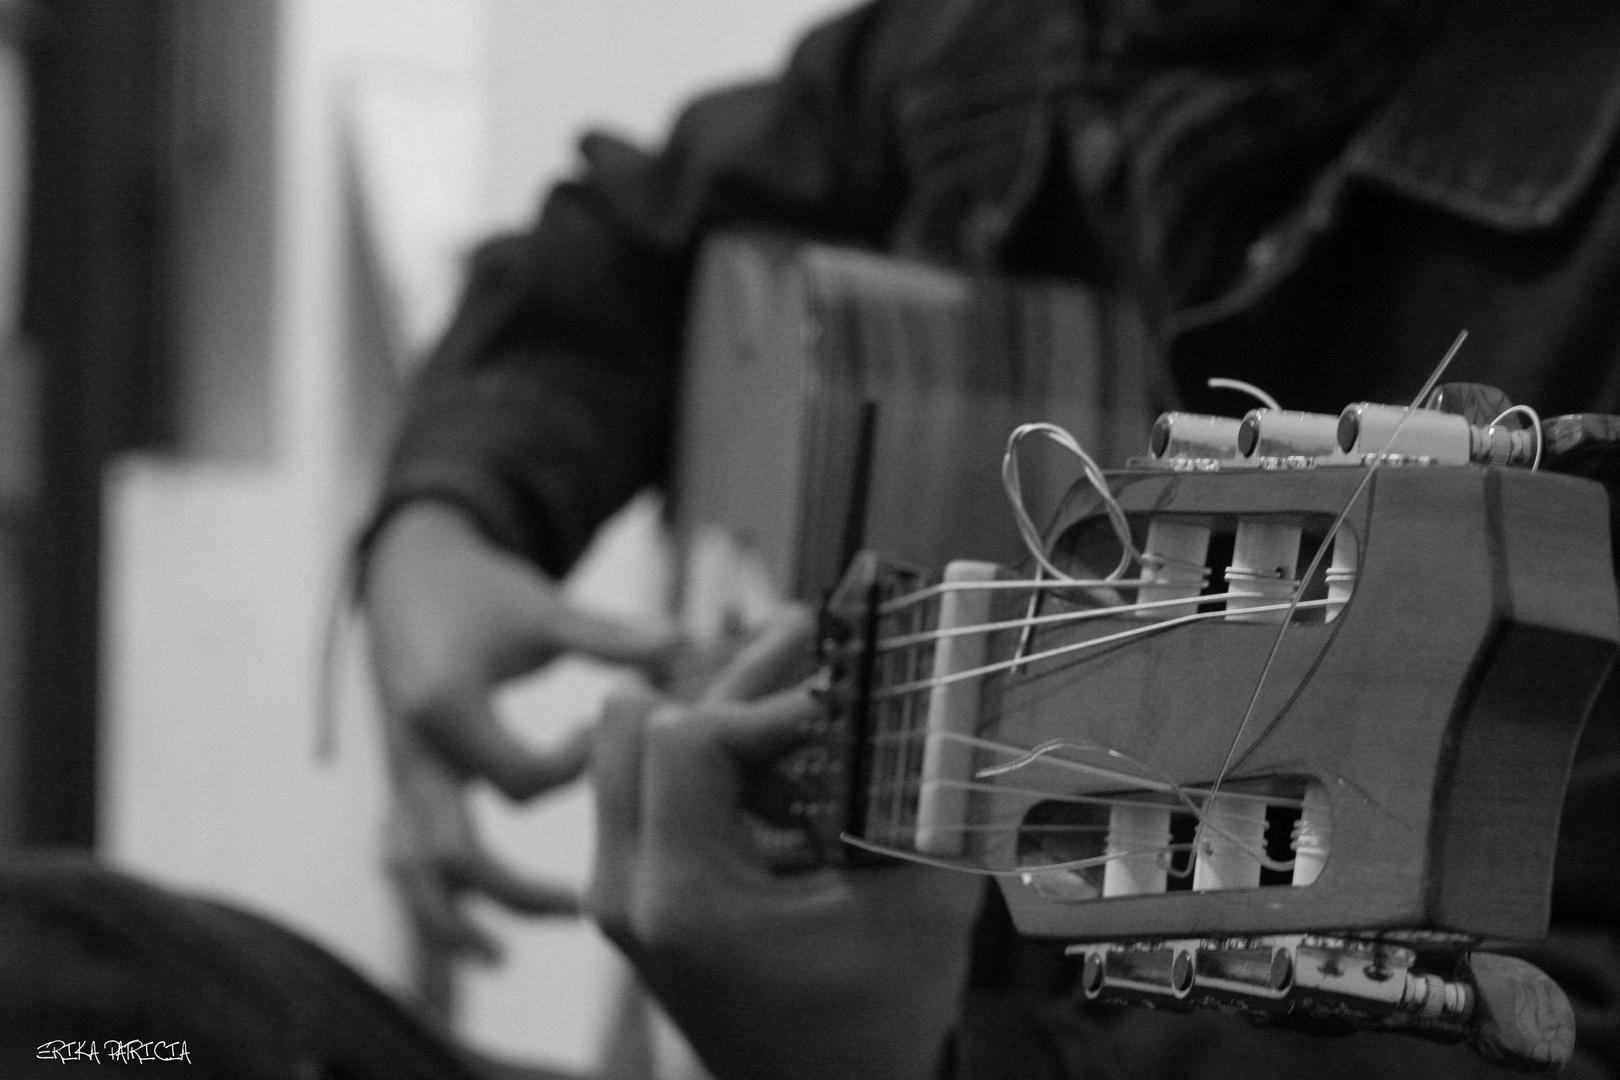 Flamenco en la guitarra